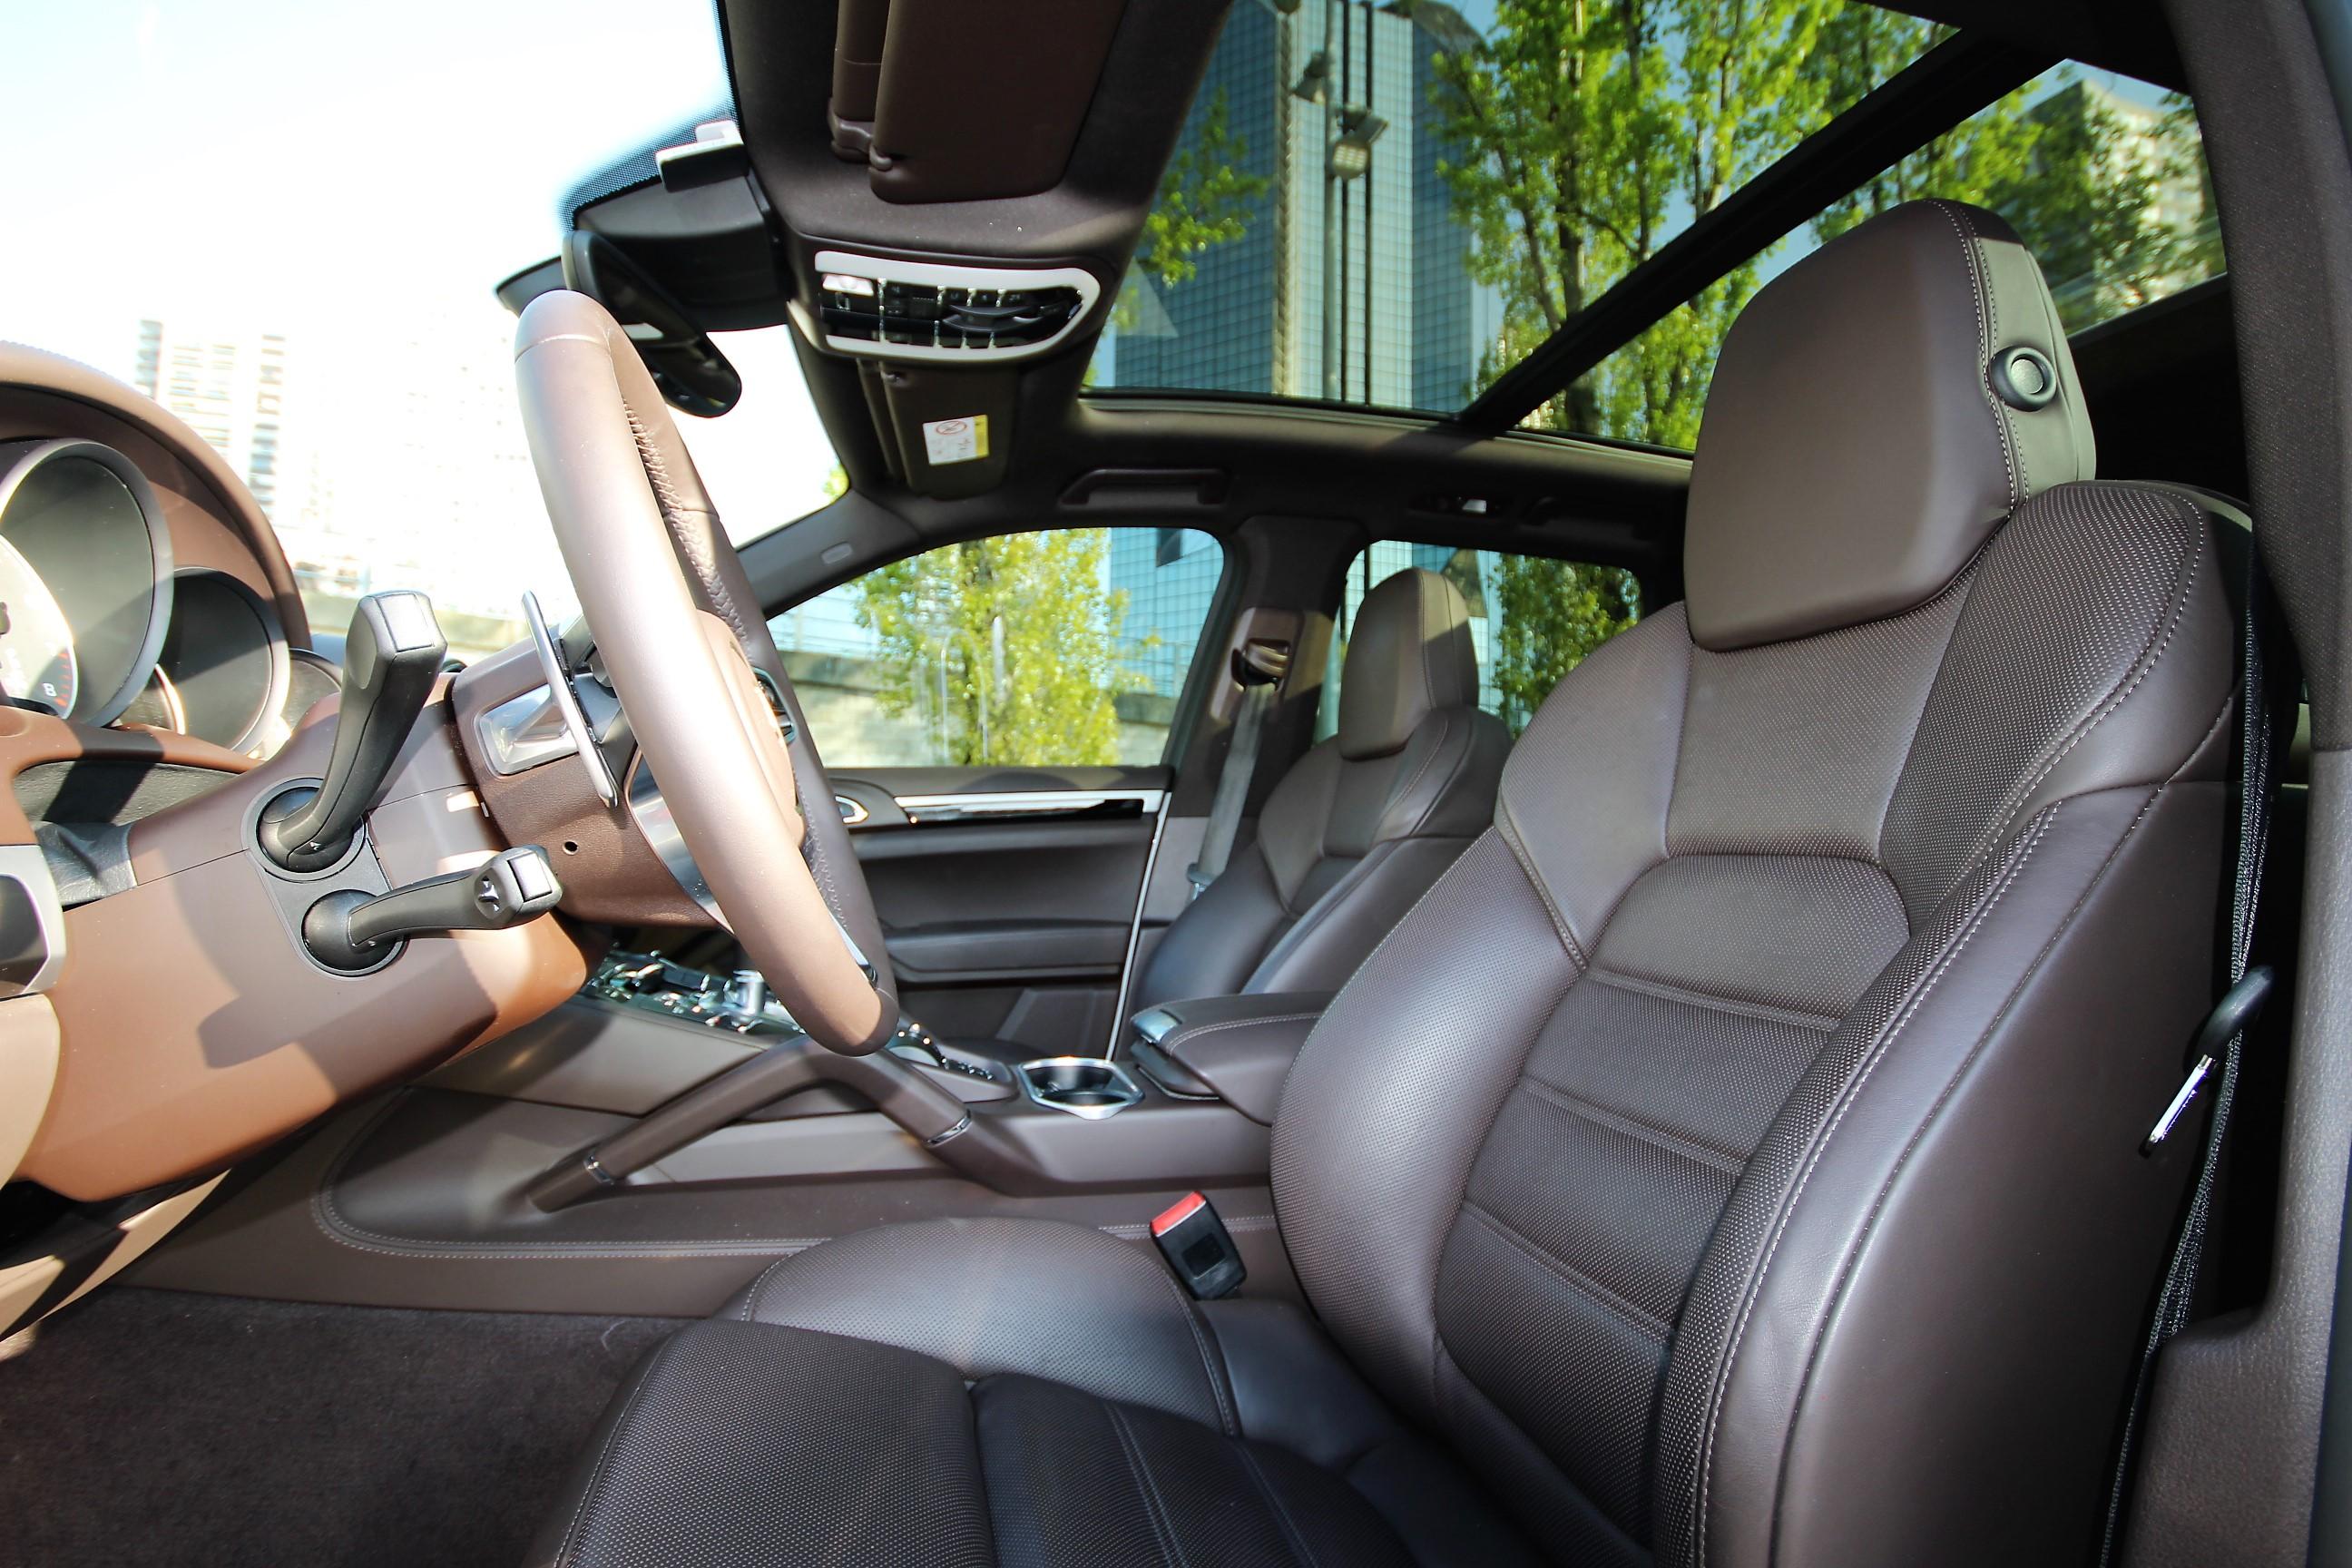 Cayenne II S E-Hybrid